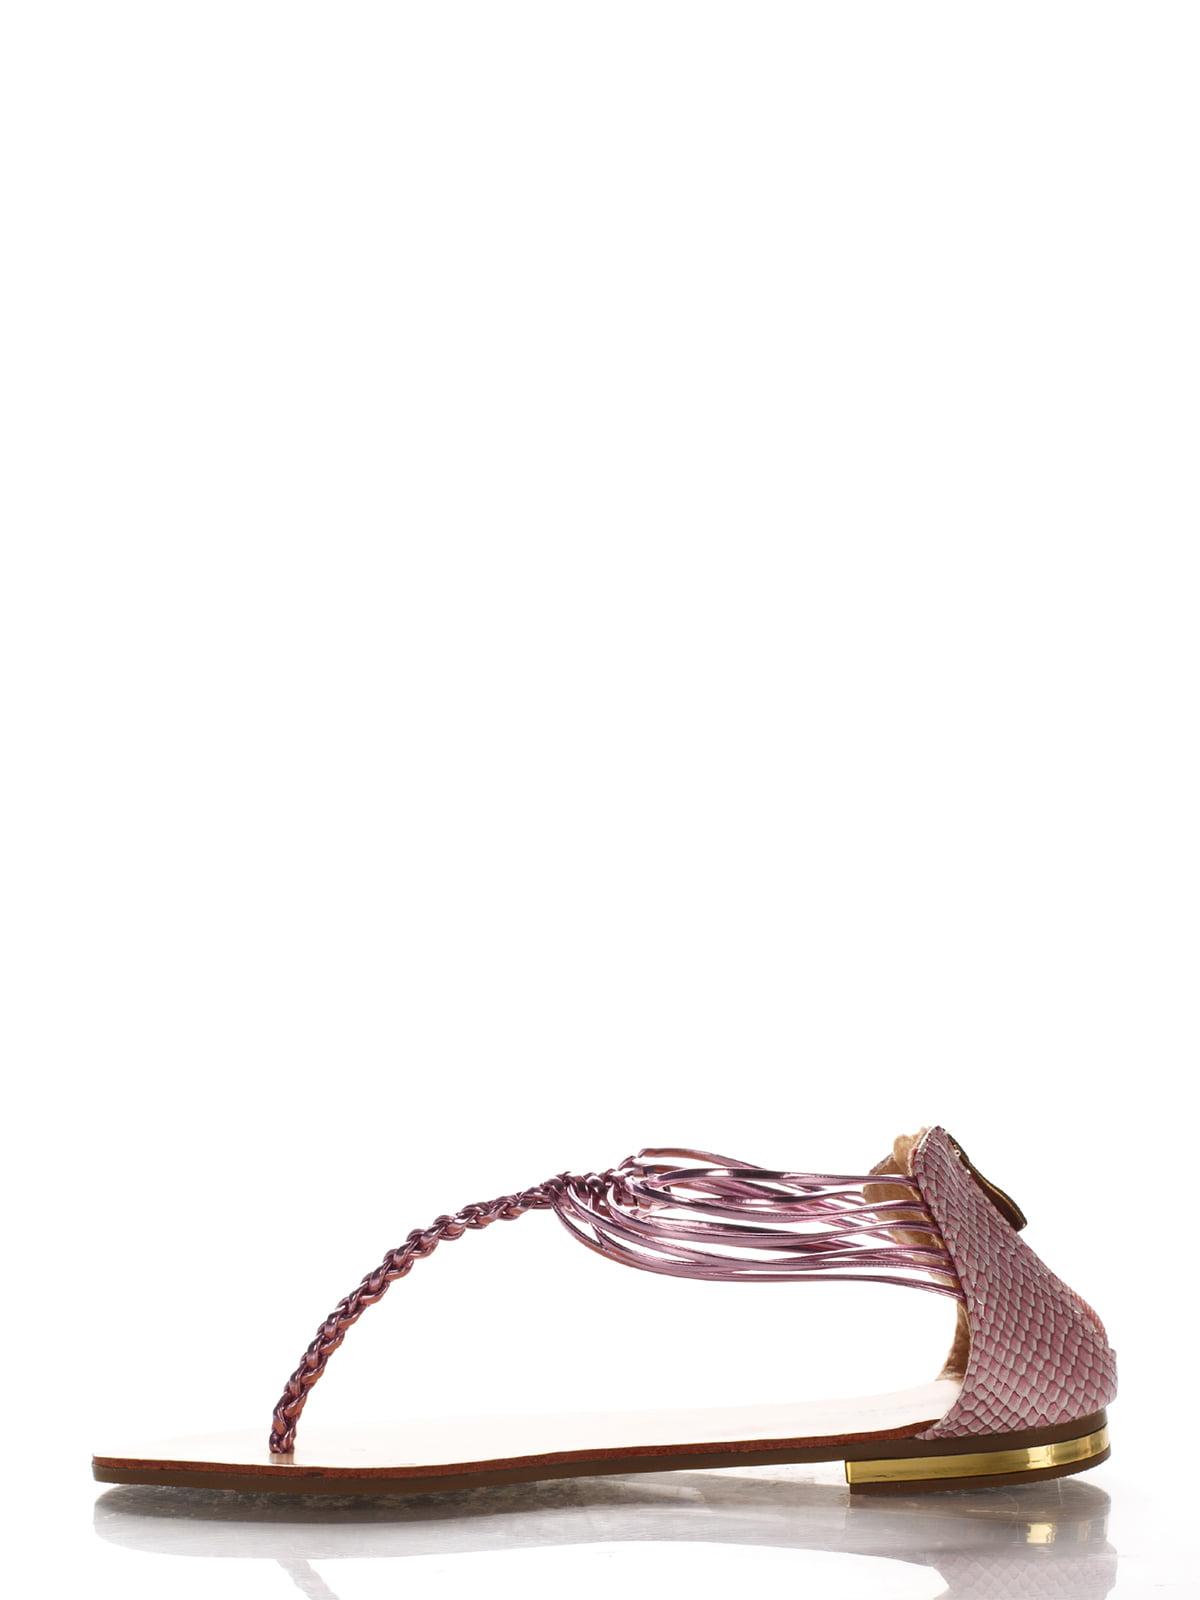 Сандалии-вьетнамки розовые | 2561648 | фото 3